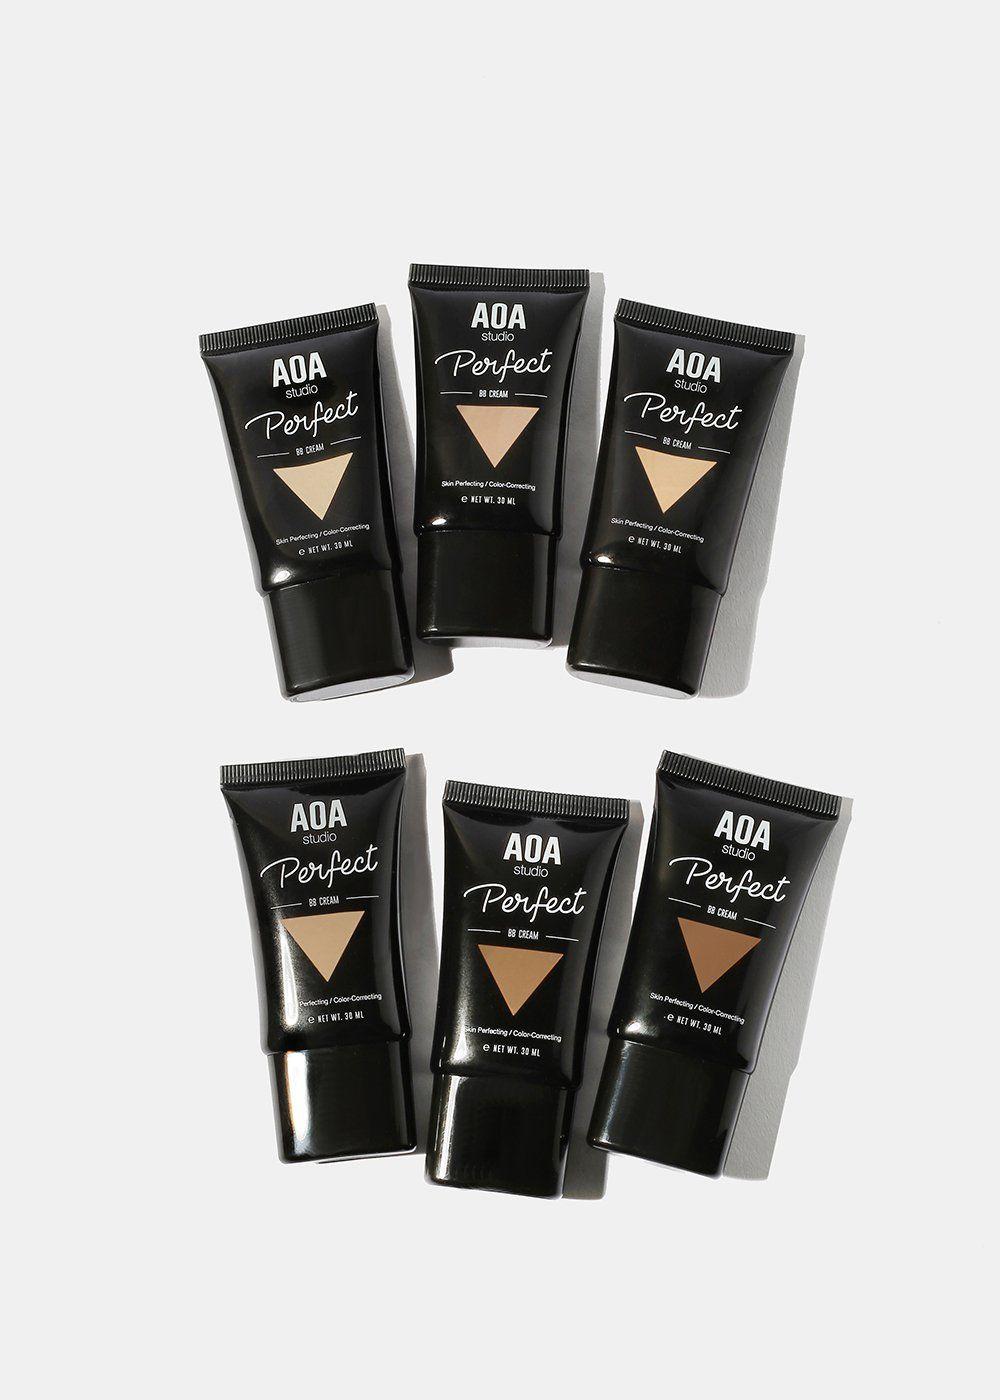 Wonder Skin - Perfecting Blur Primer by AOA Studio #22